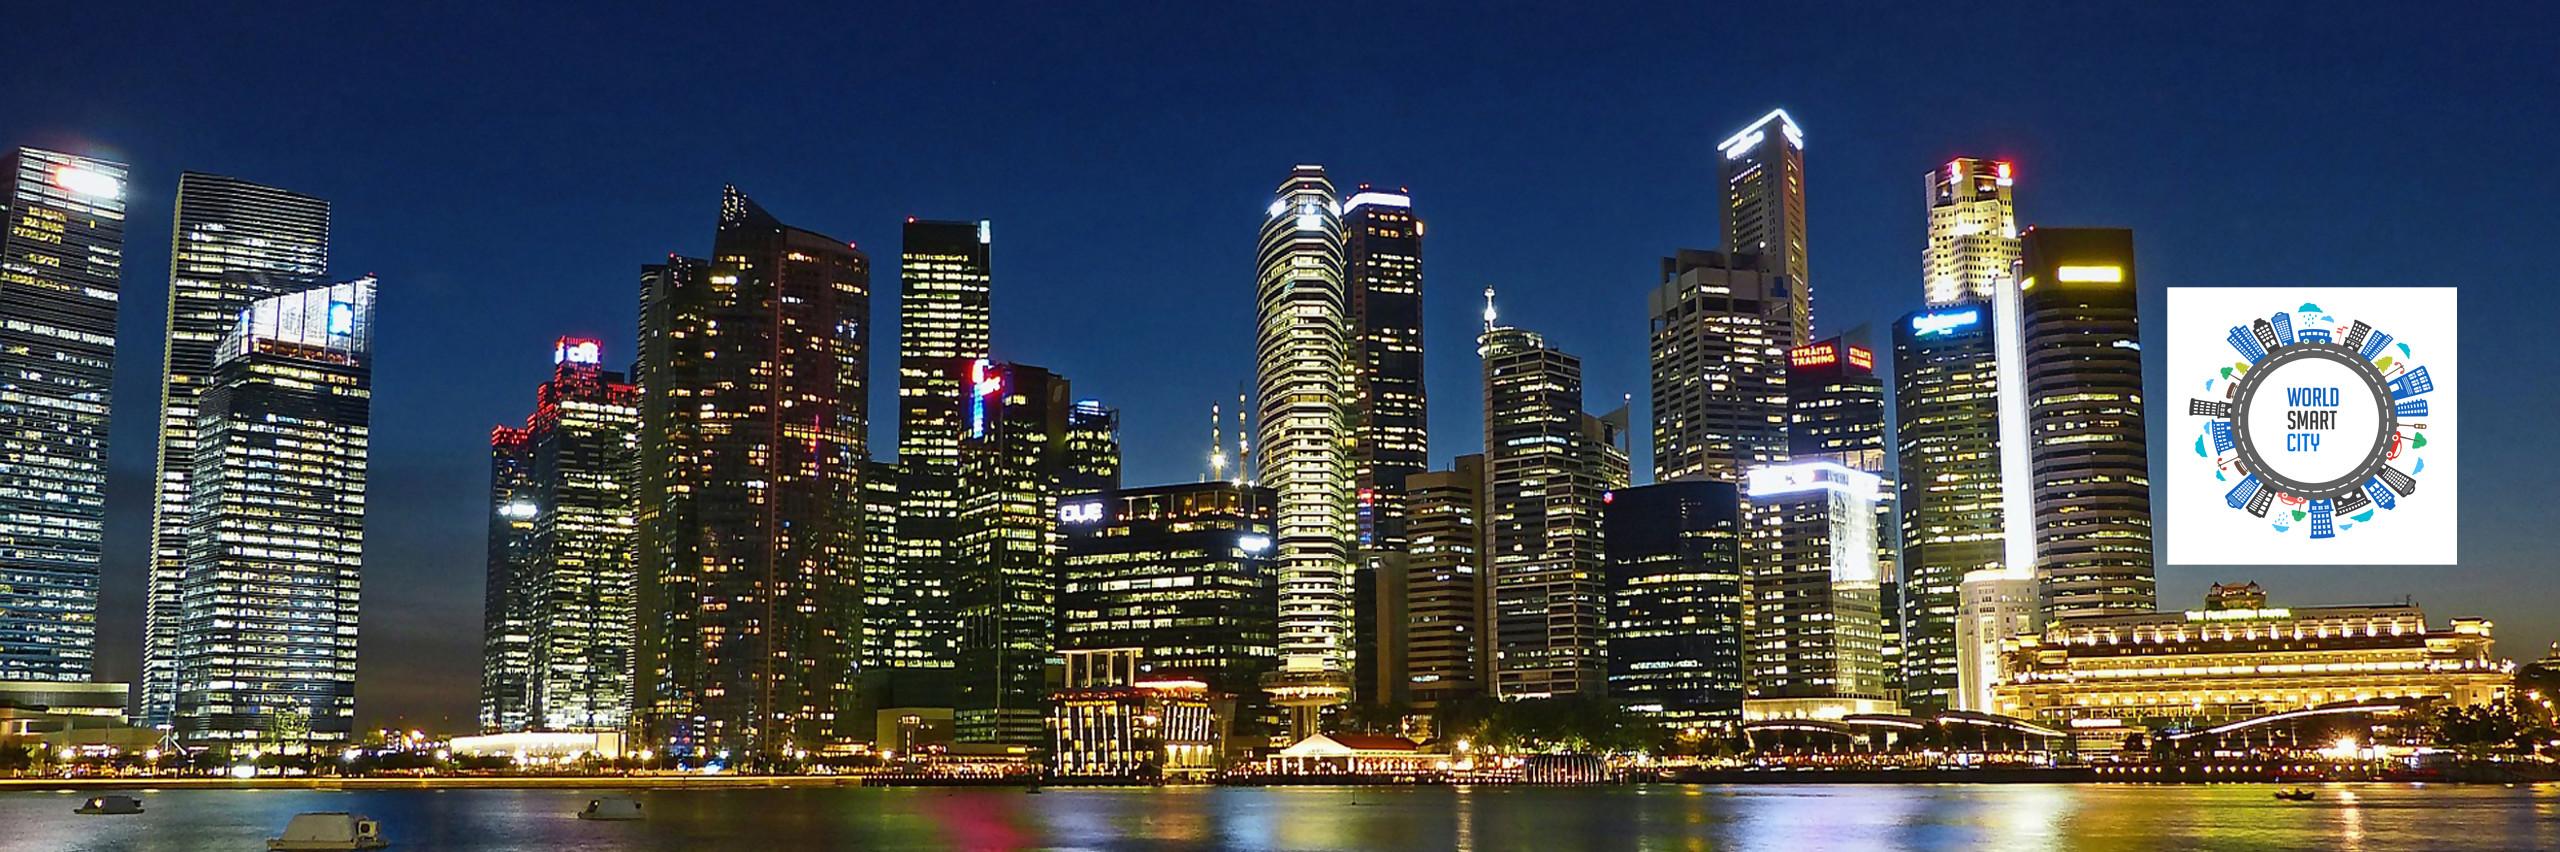 World Smart City Forum